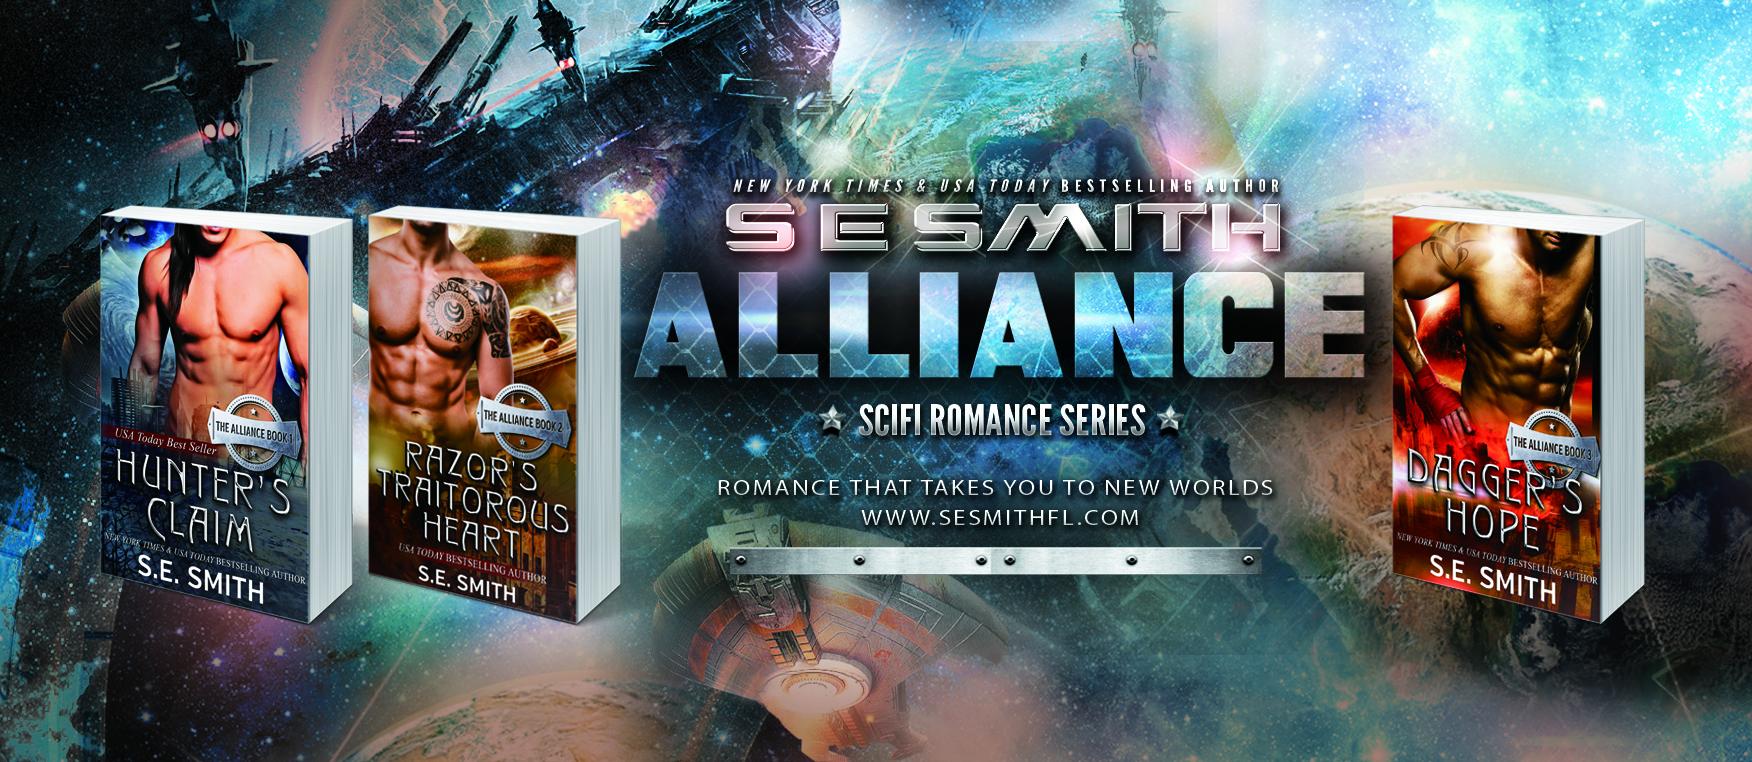 Bookmark Alliance